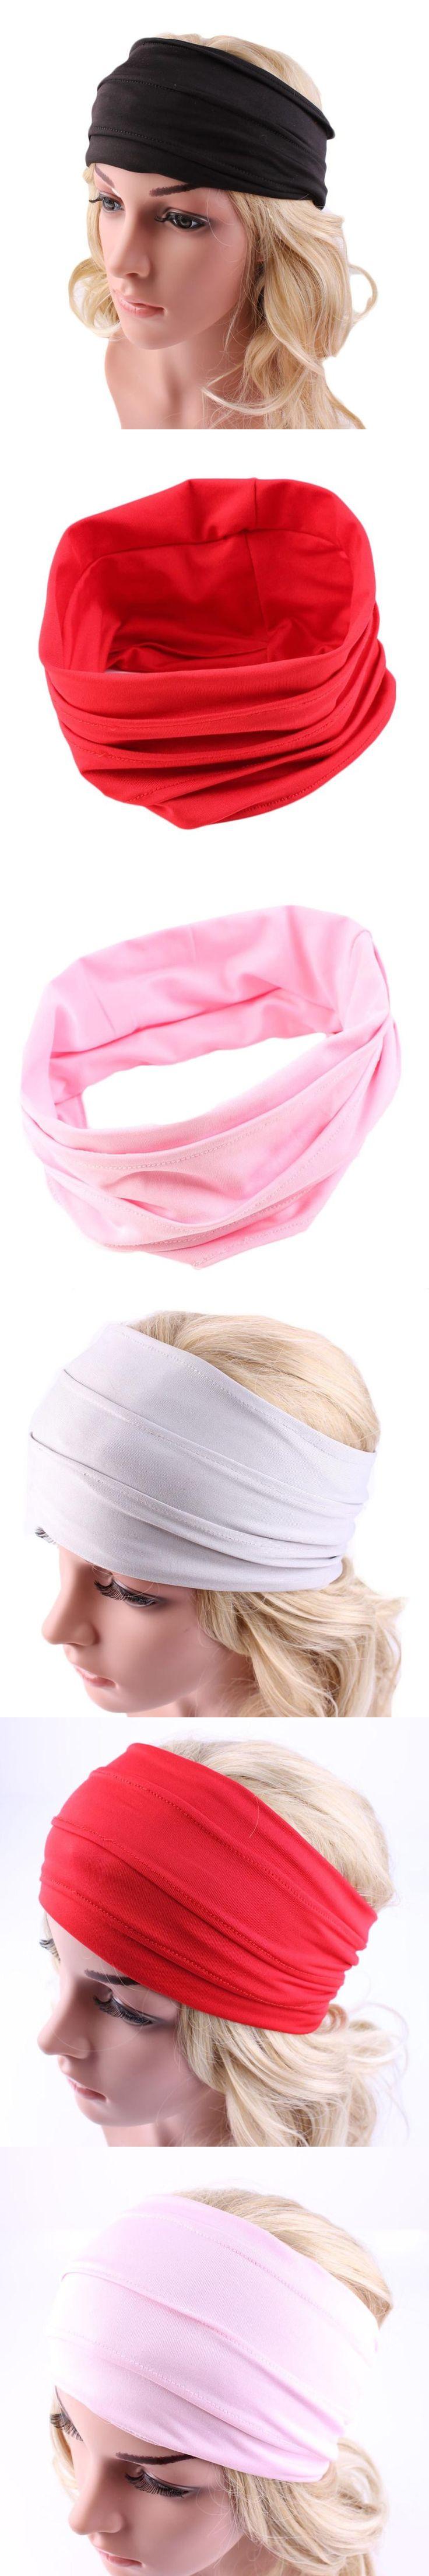 MUQGEW 2017 stylish Womens Hair Accessories  Headwrap Nonslip Wide Headband Yoga Headband Boho Headwear Running Head band